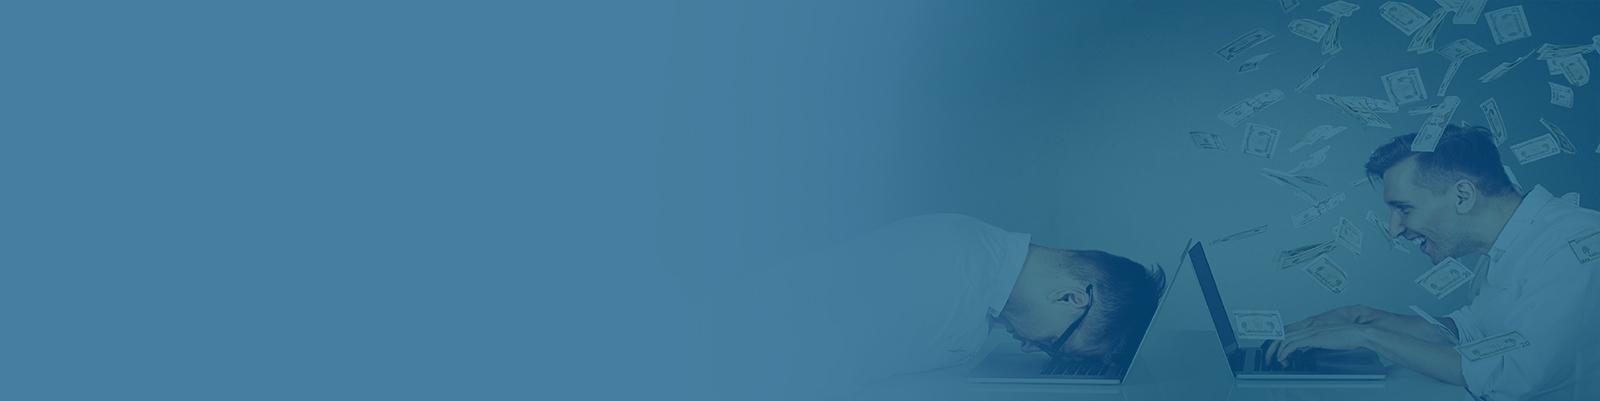 Ad-Fraud-Report-Promo-Slide-for-Homepage-Rotator